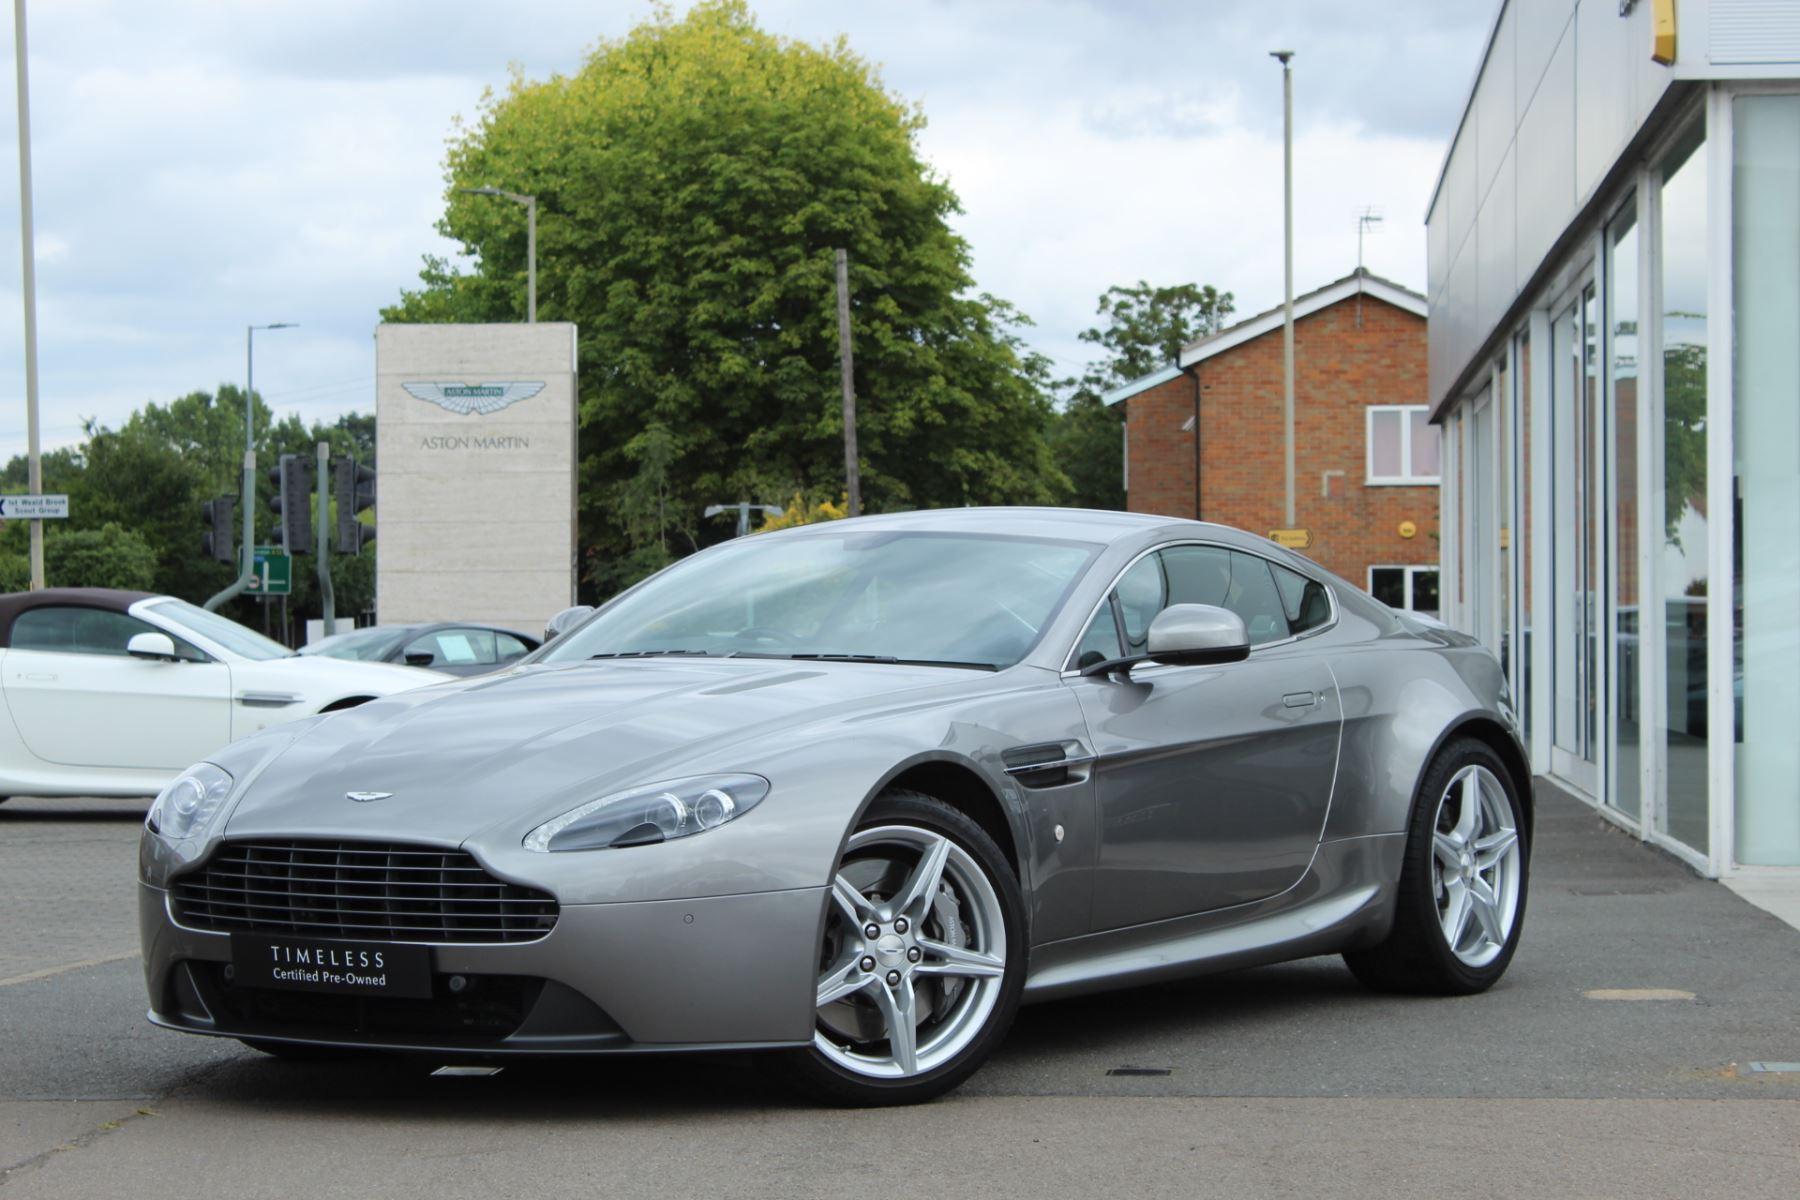 Aston Martin V8 Vantage Coupe 2dr Sportshift [420] image 2